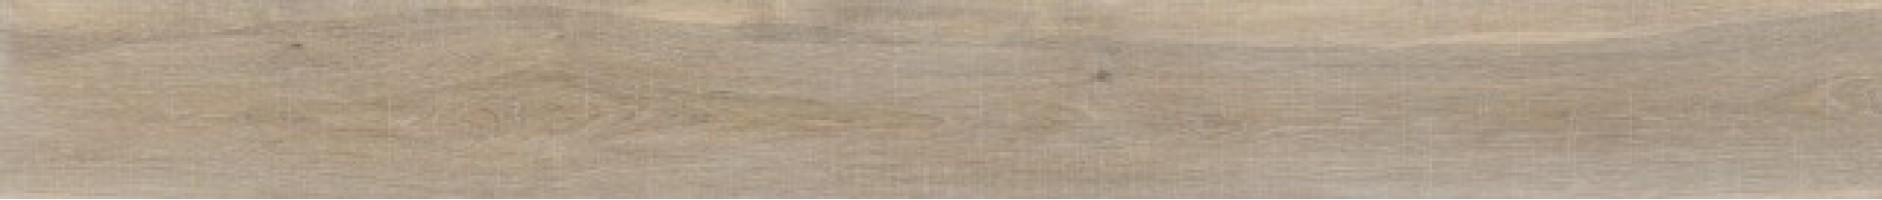 Керамогранит Porcelanosa Devon Arce 19.3x180 P16700811